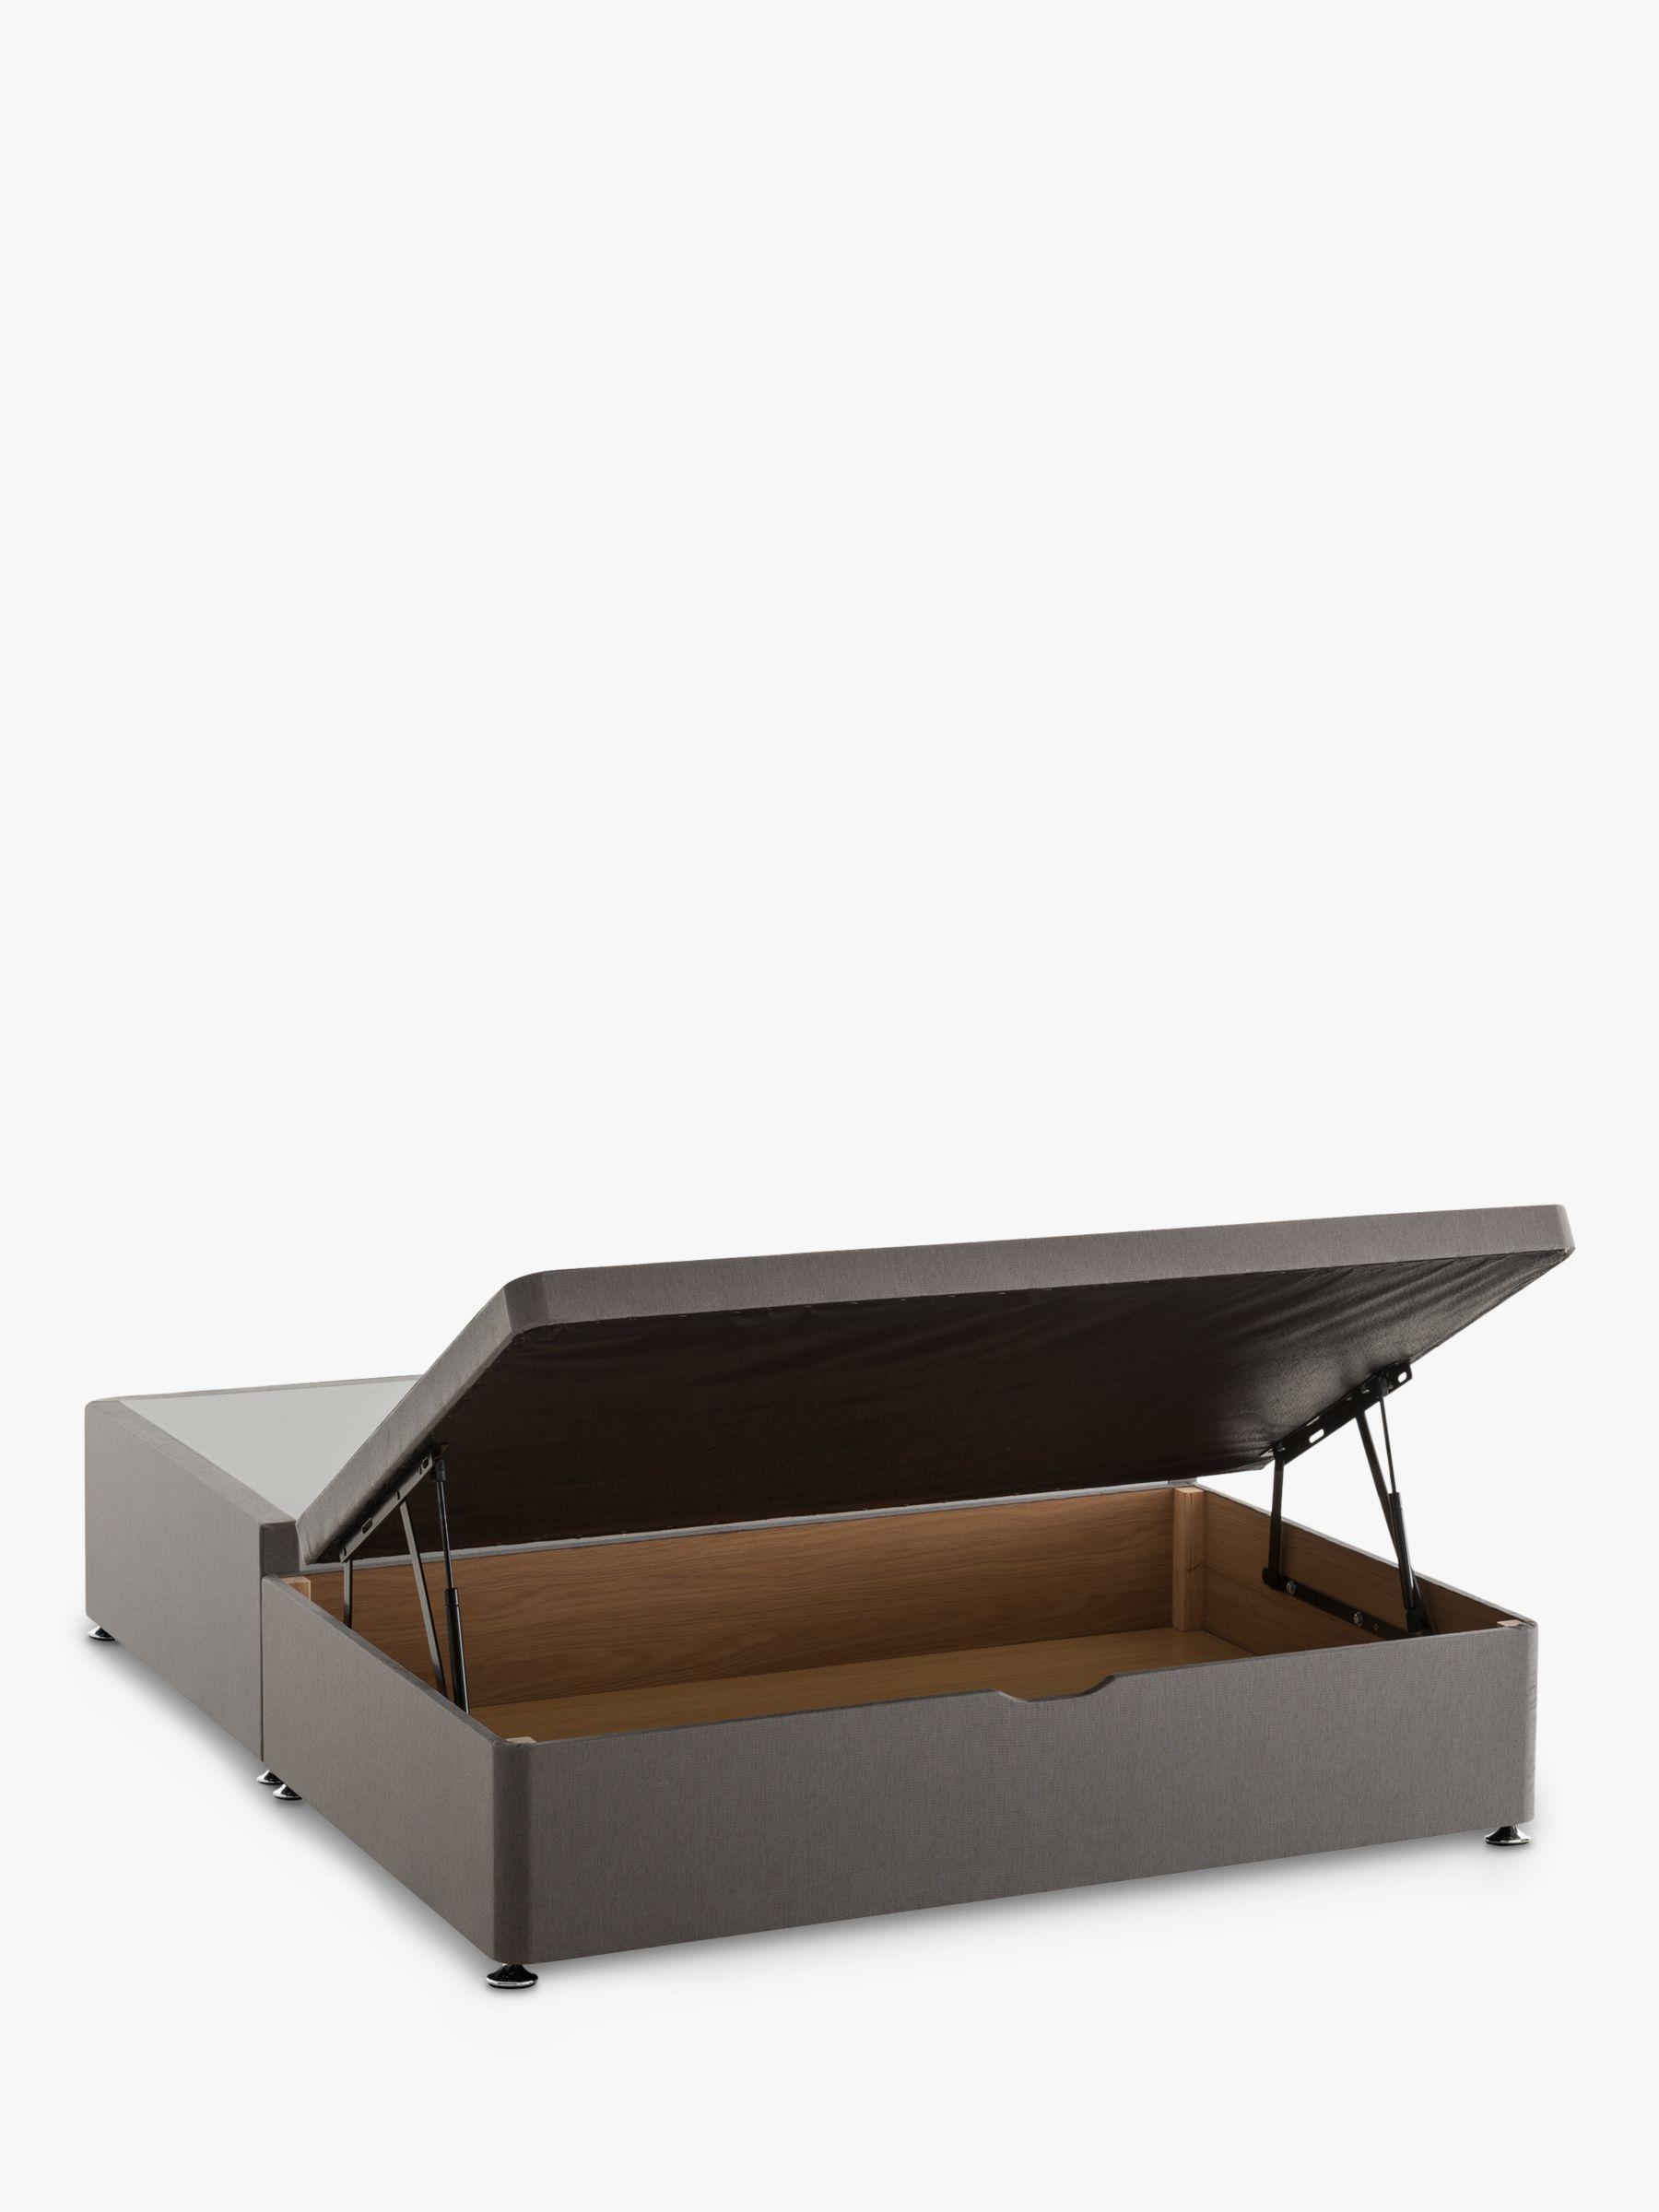 Silentnight End Divan Ottoman Storage Bed Double At John Lewis Partners